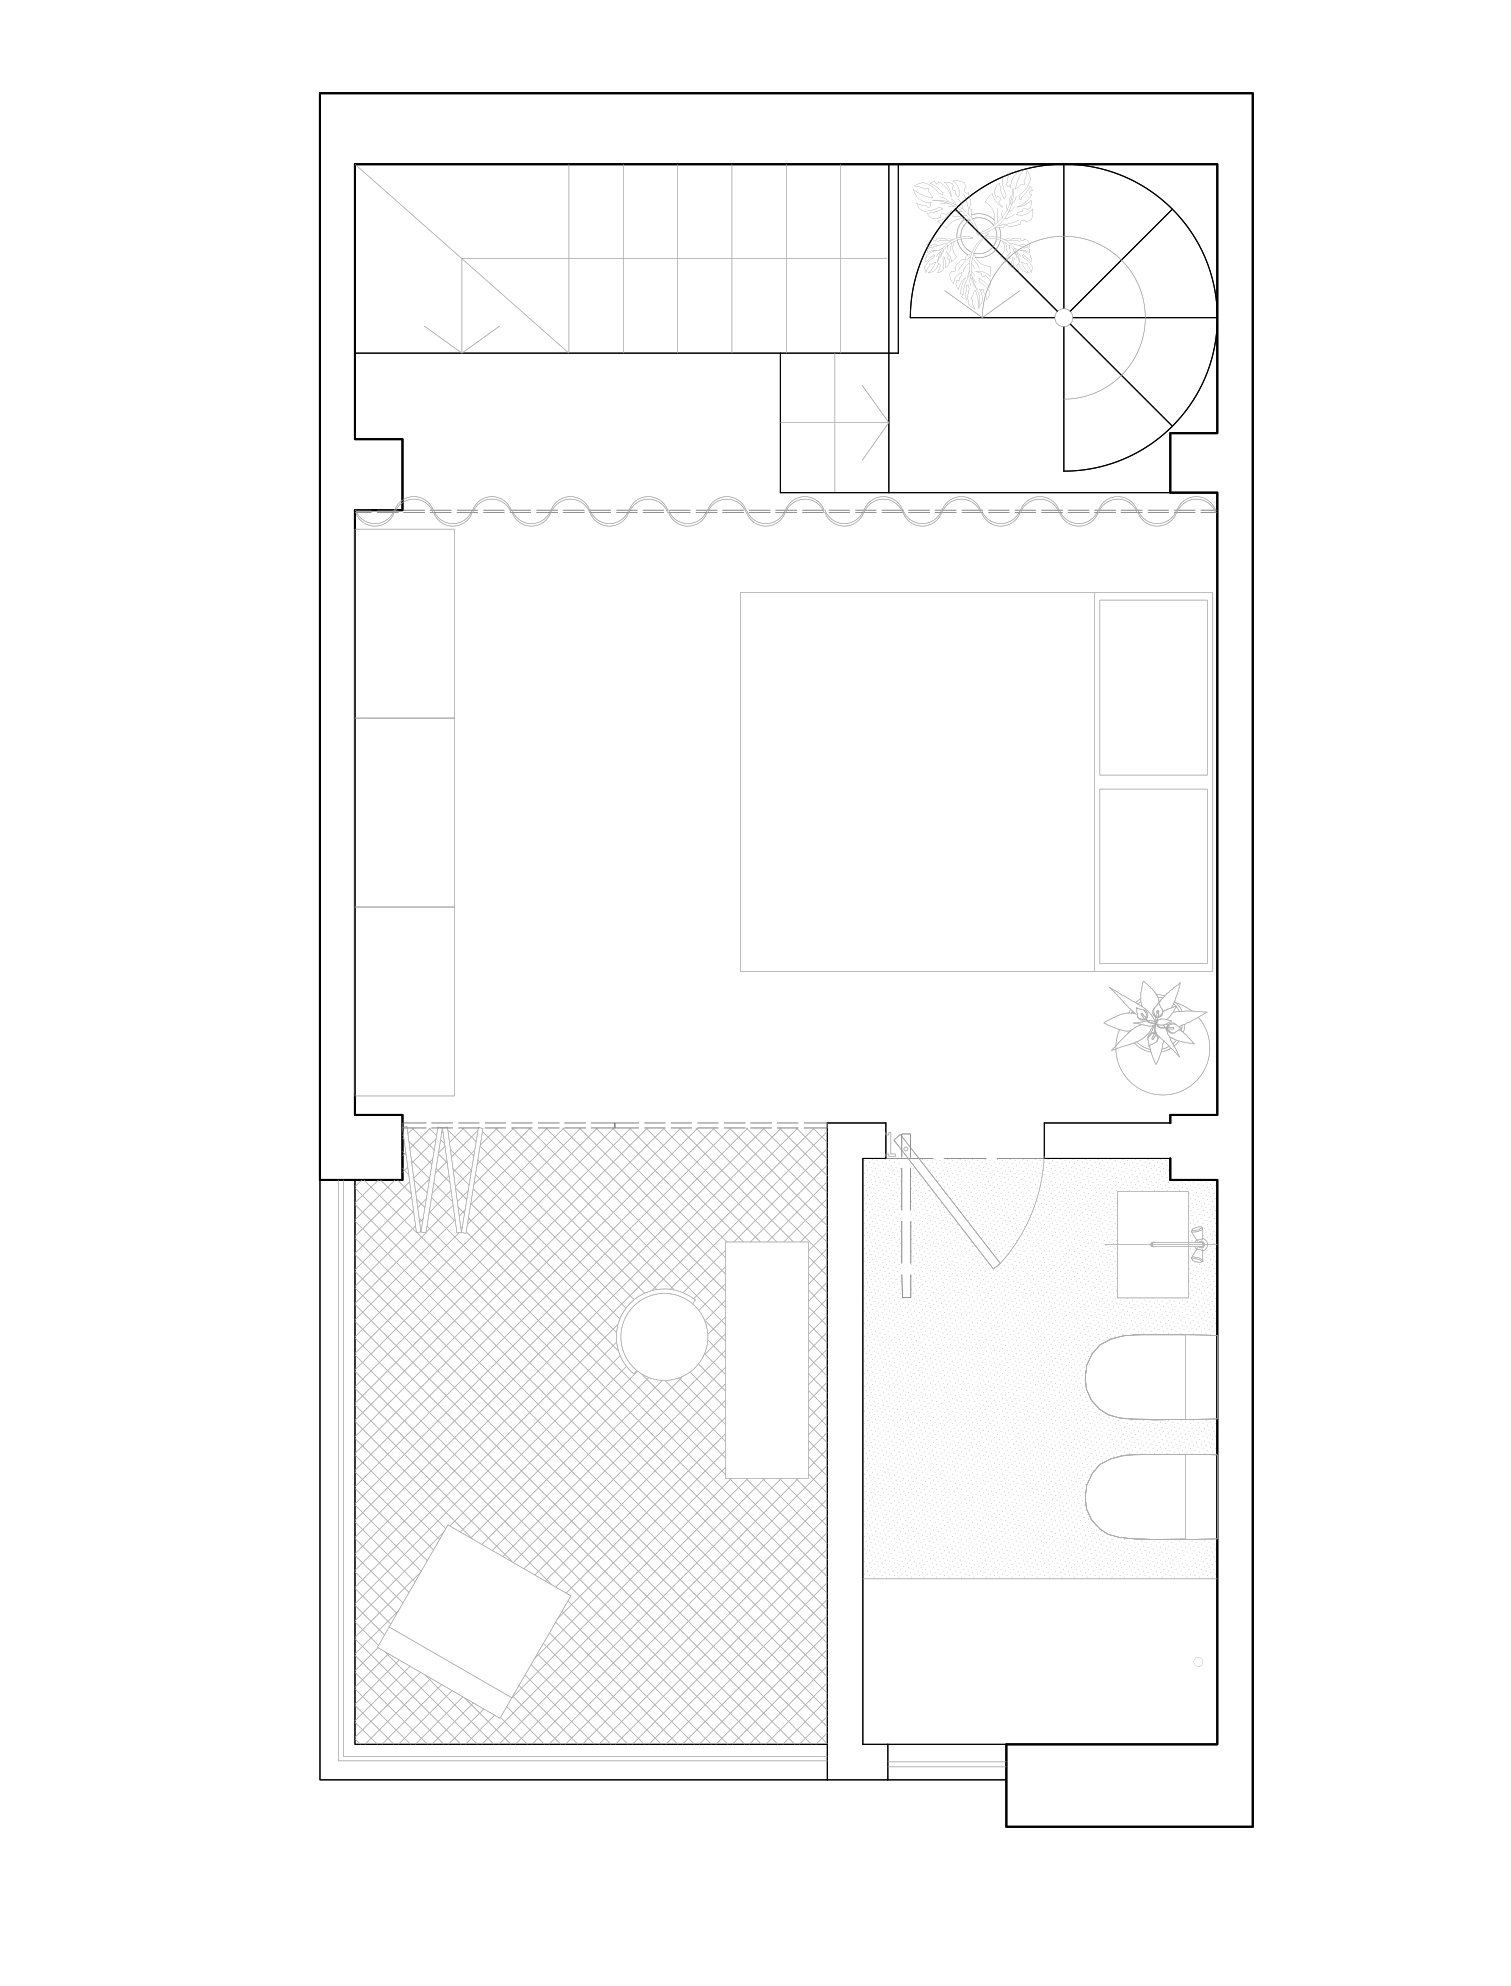 architecture floor plan